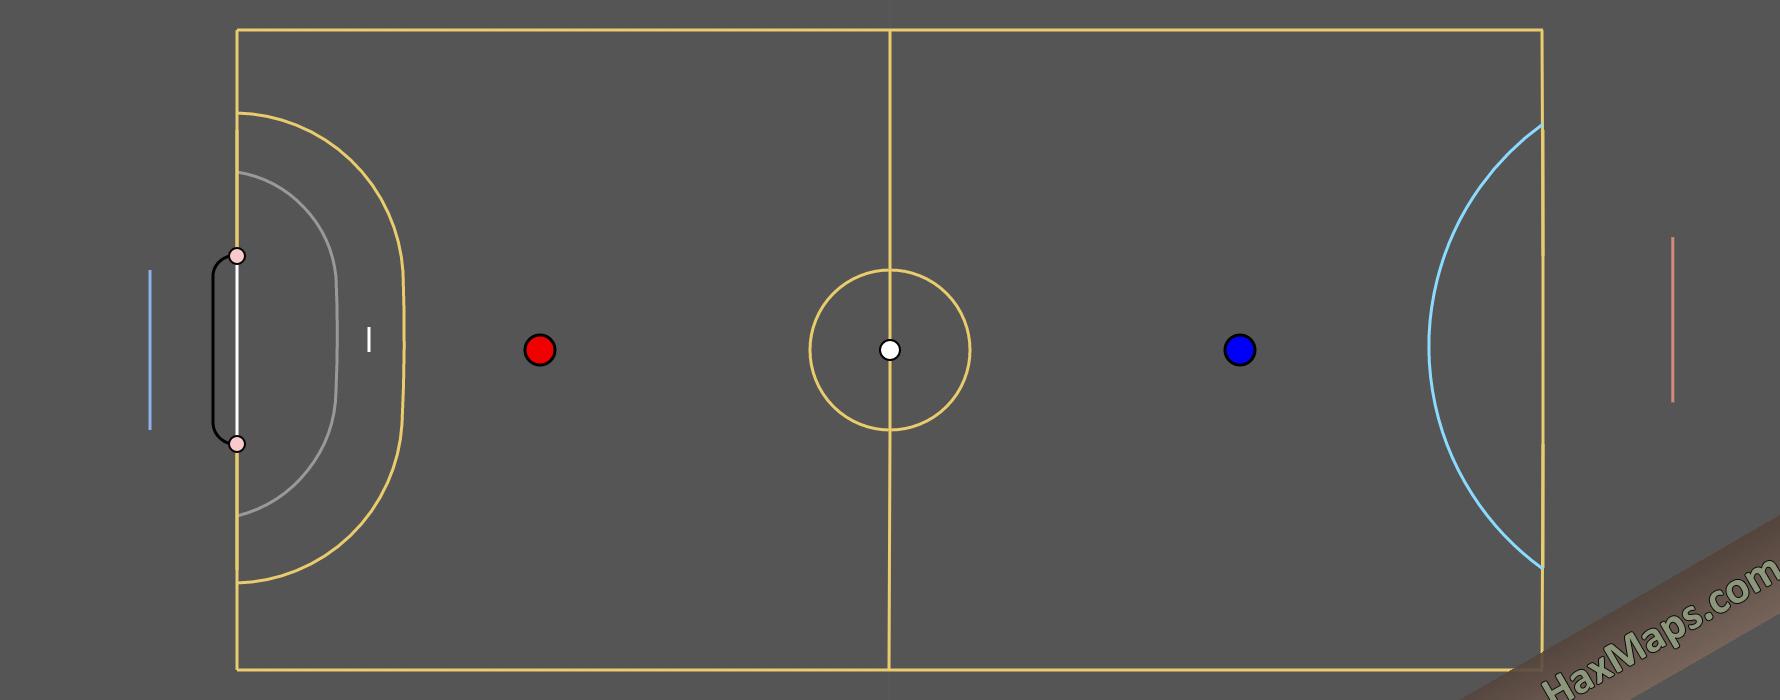 hax ball maps | Mini RS Wolfgang